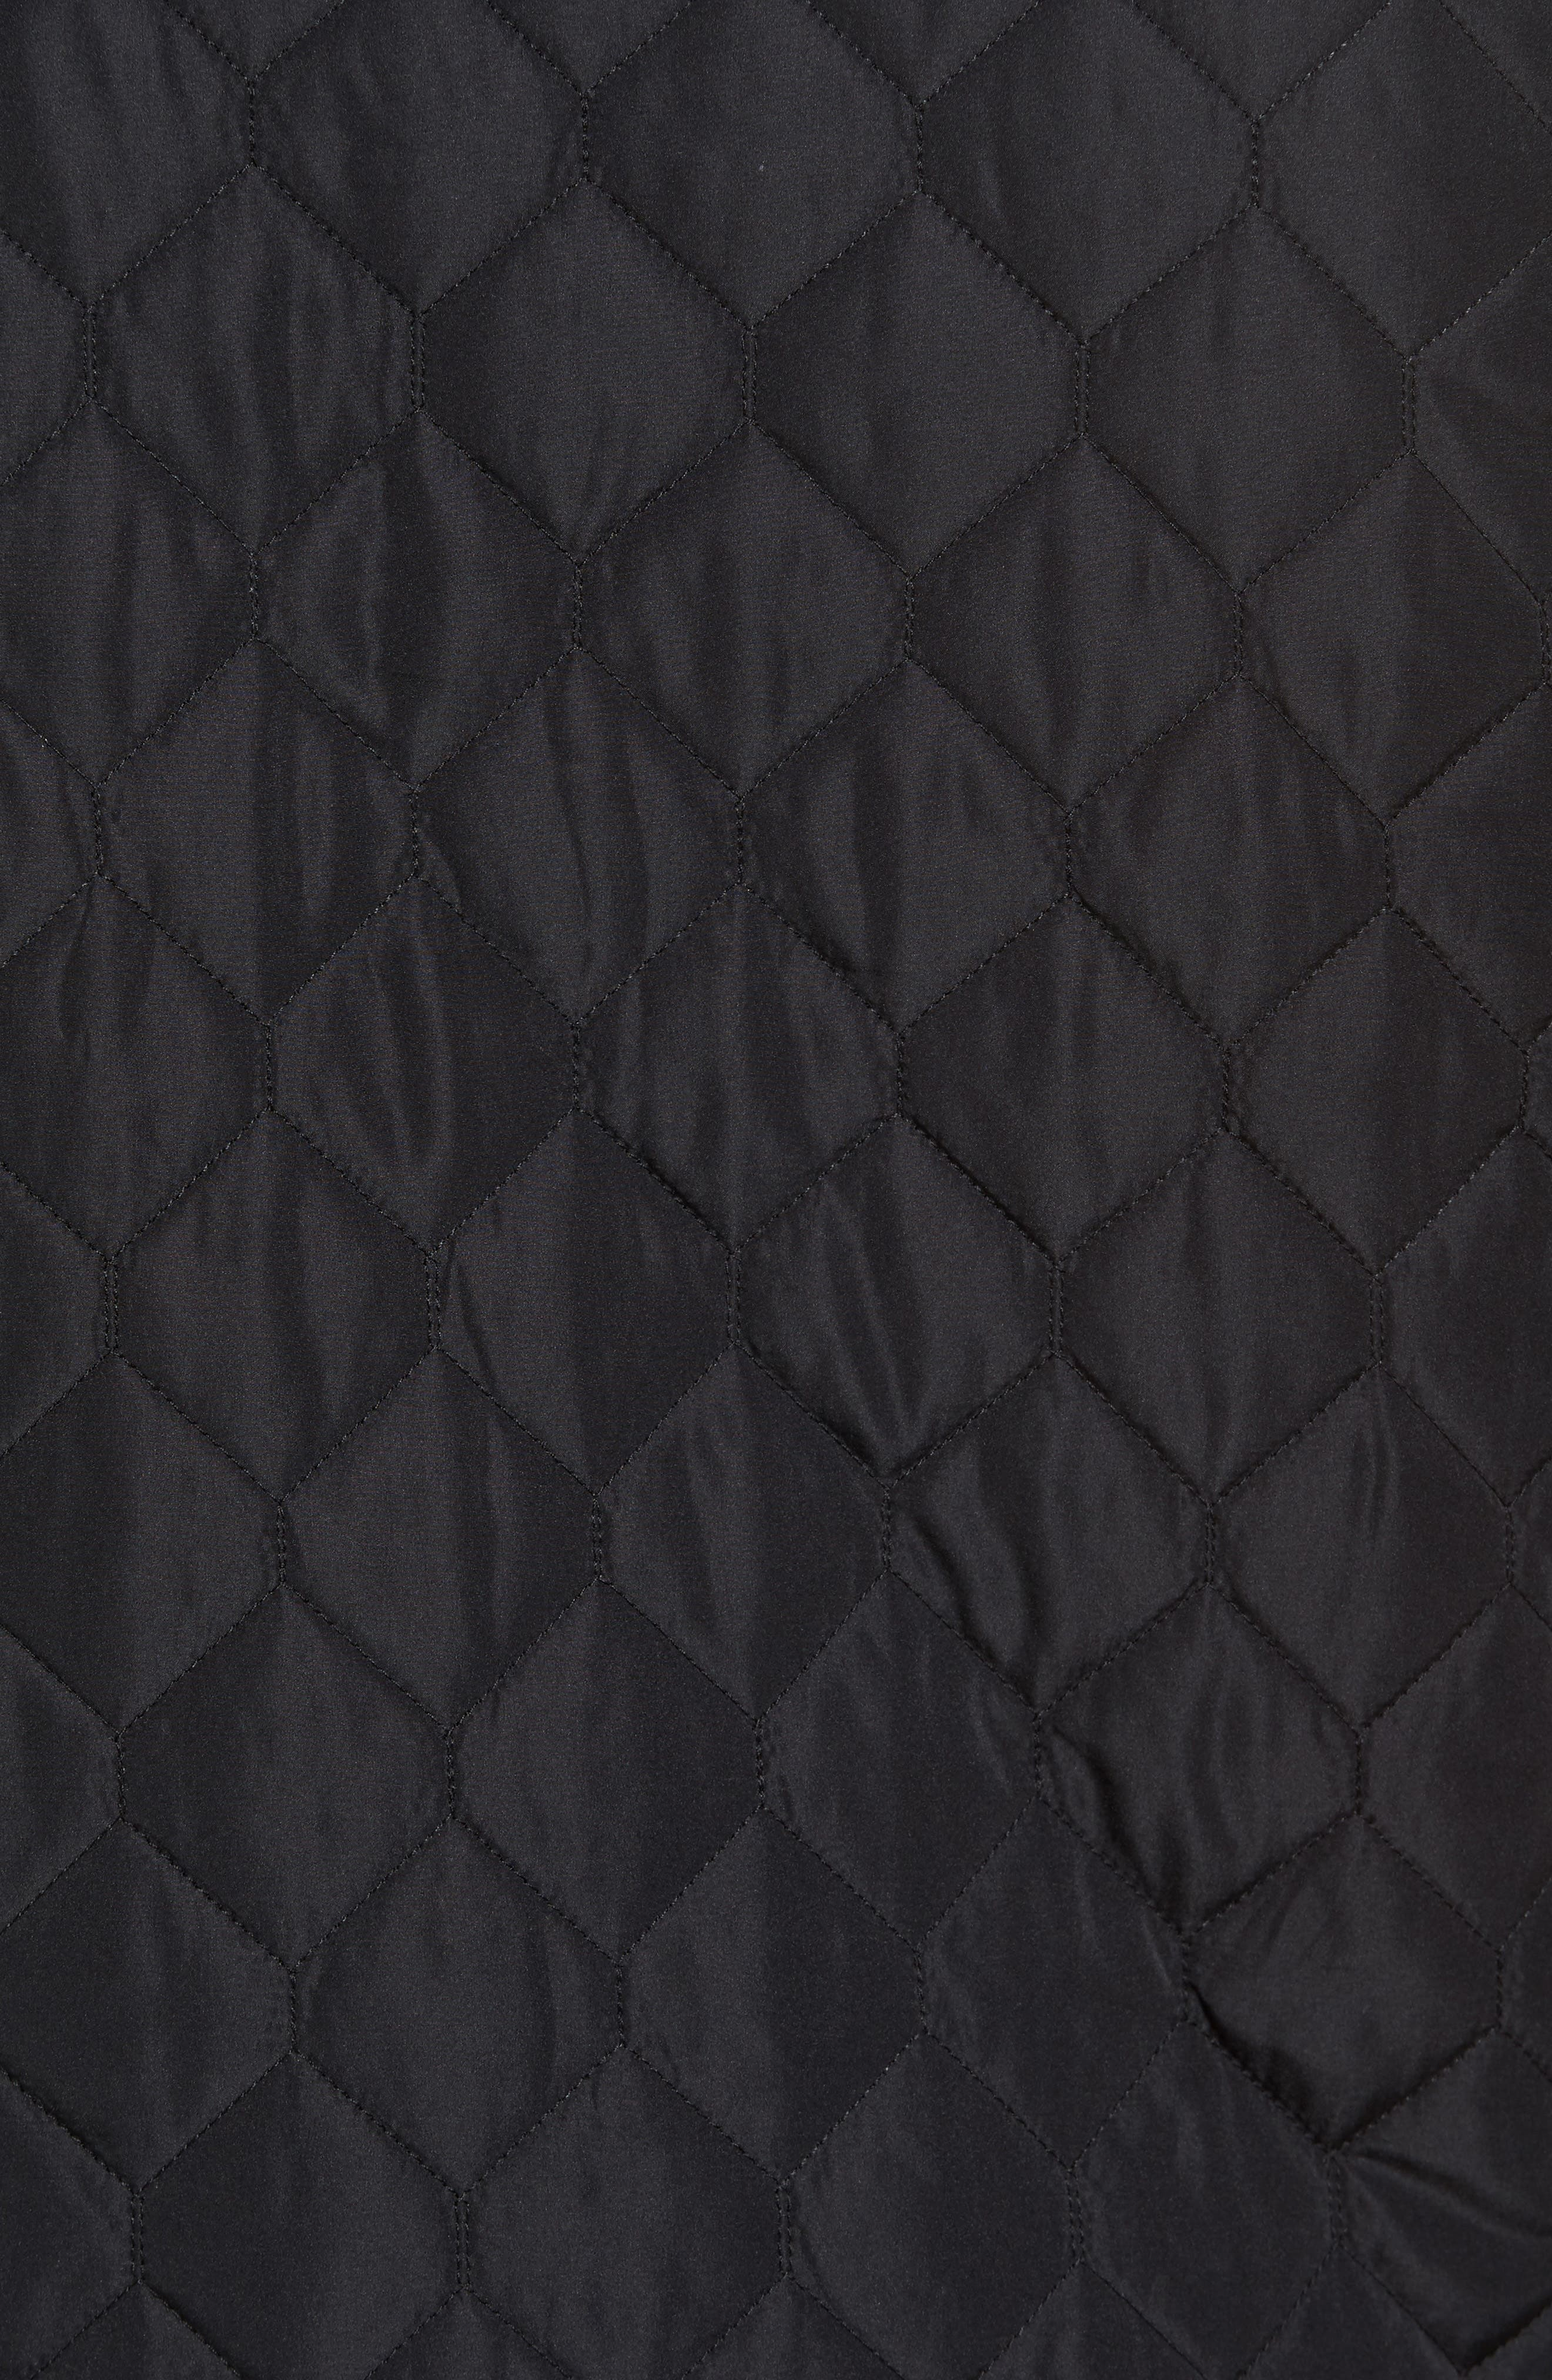 Replicant Quilted Vest,                             Alternate thumbnail 5, color,                             Black